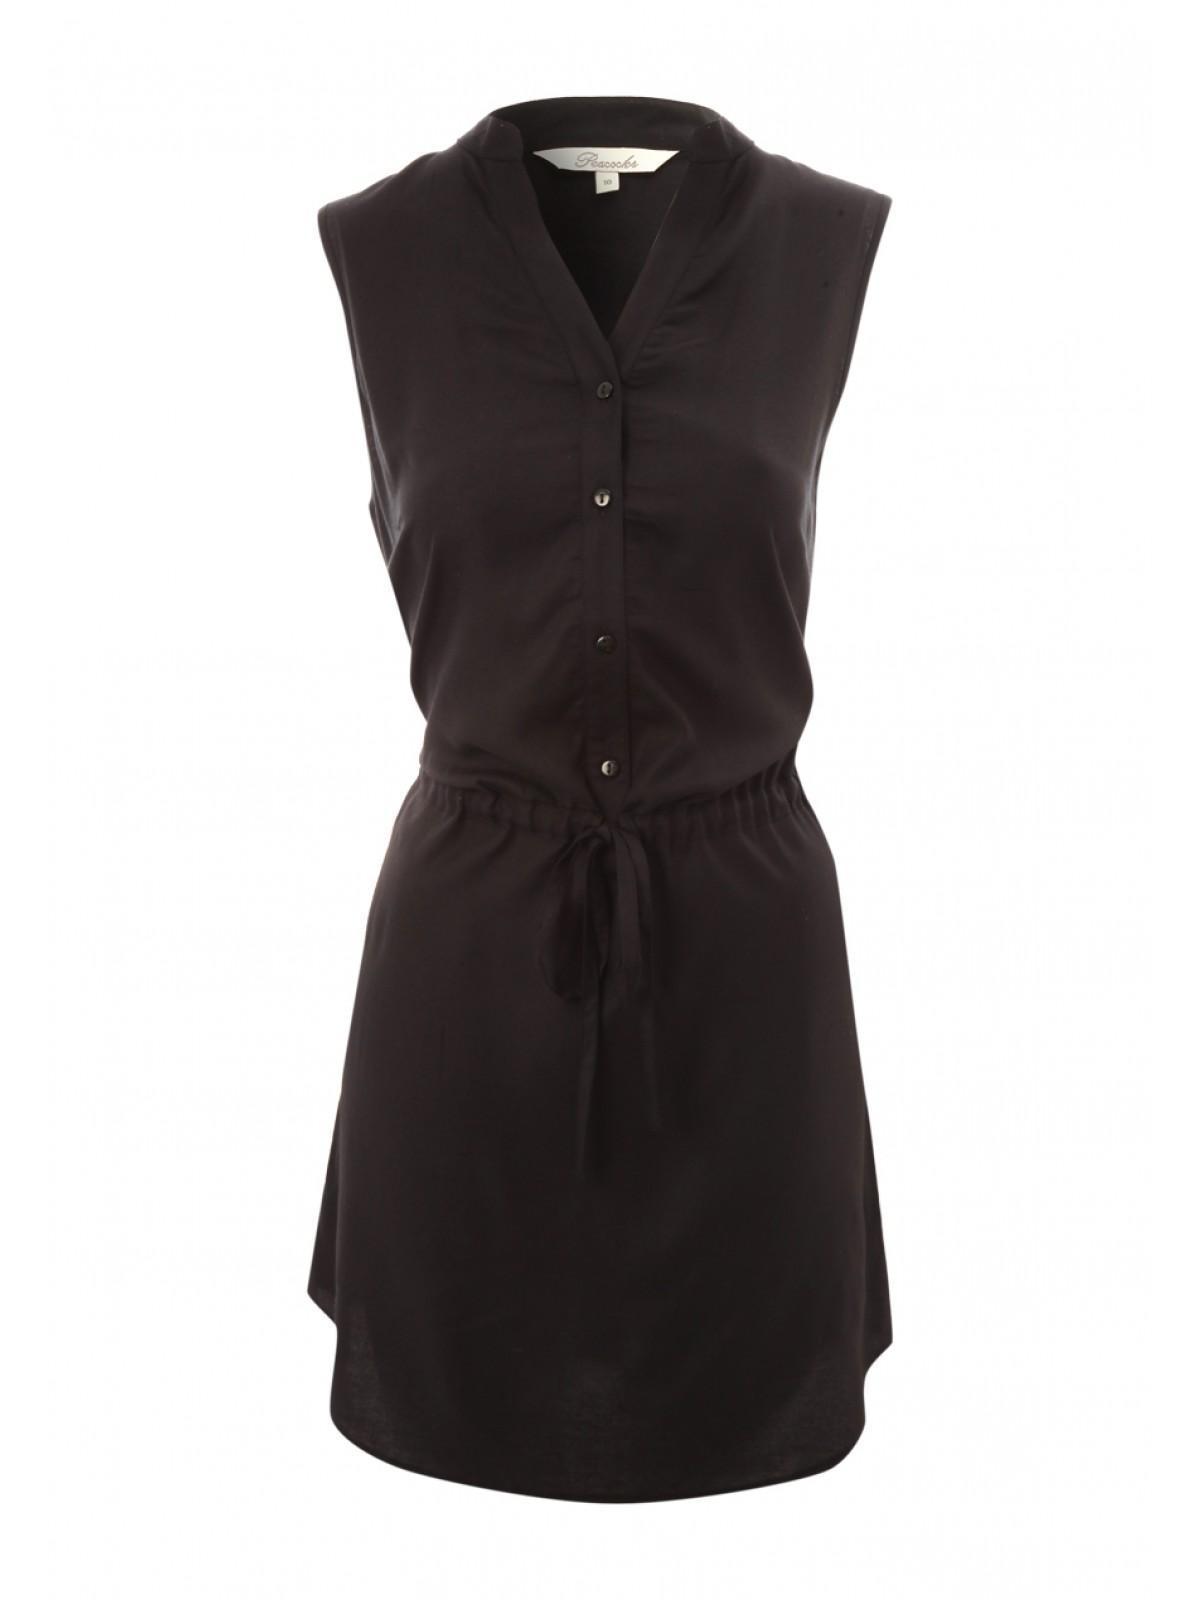 Plain Tunic Dress Women's Plain Viscose Tunic